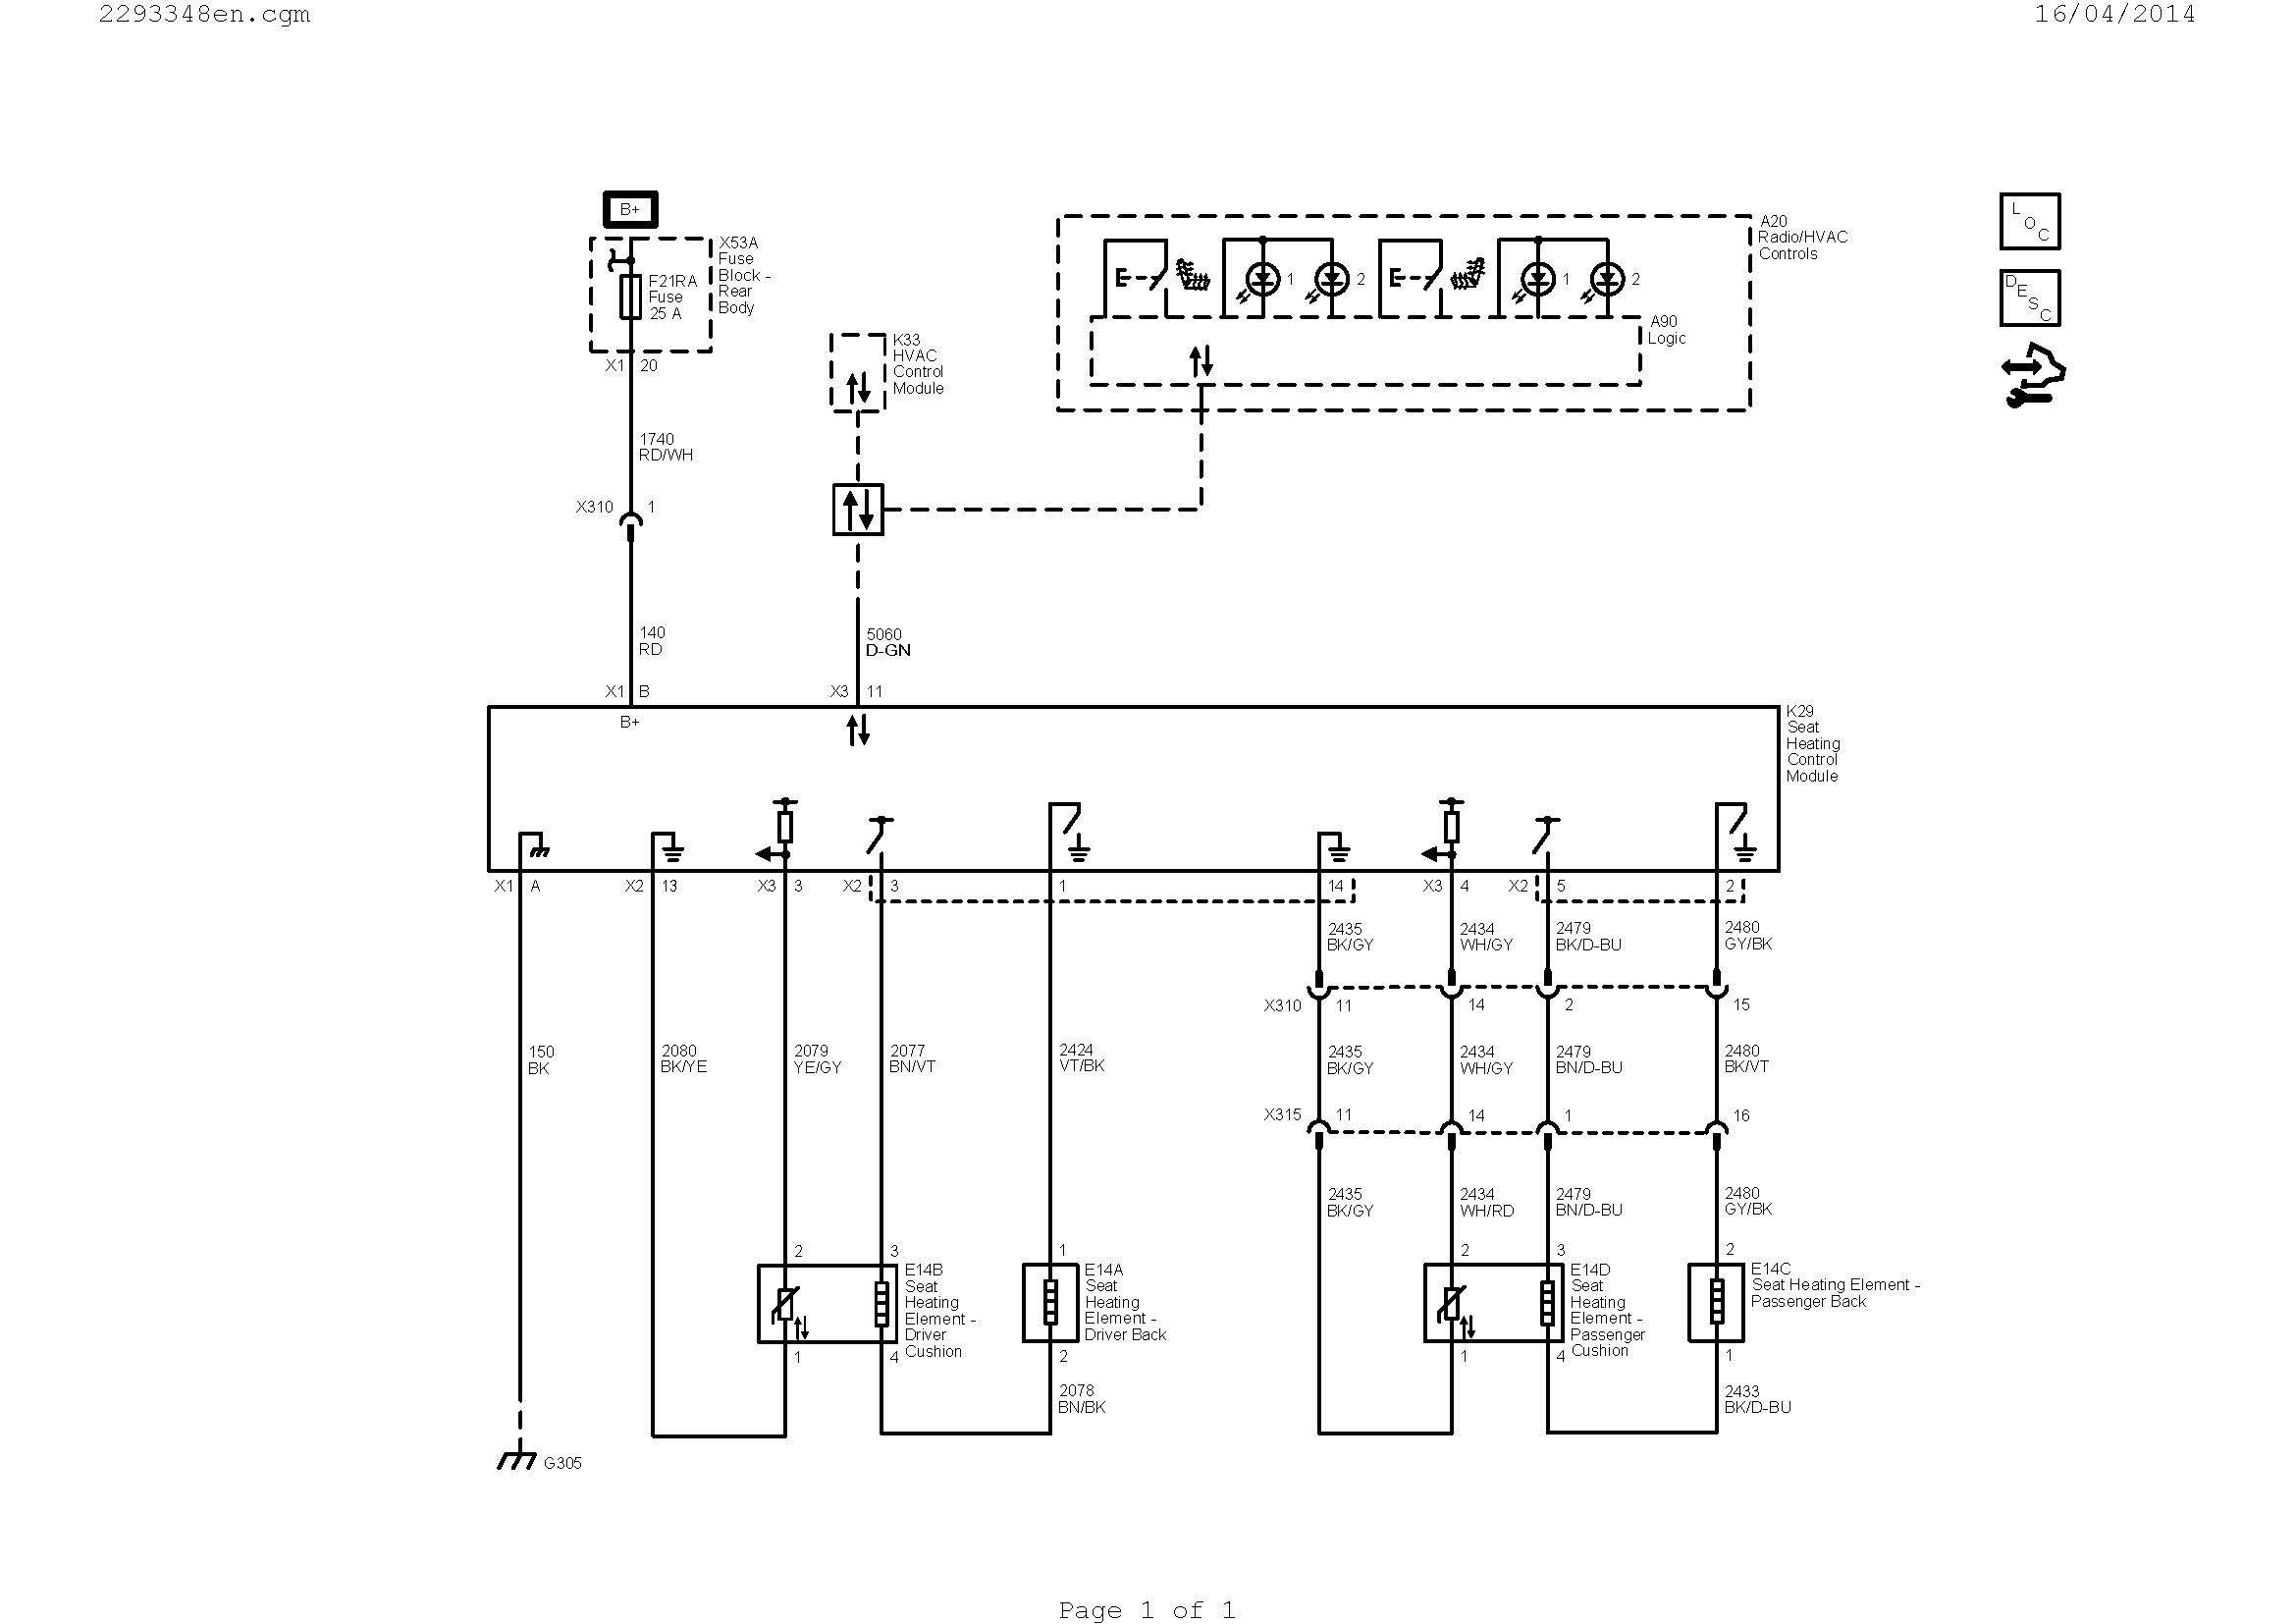 show wiring diagram Collection understanding hvac wiring diagrams Download Diagram Websites Unique Hvac Diagram 0d DOWNLOAD Wiring Diagram